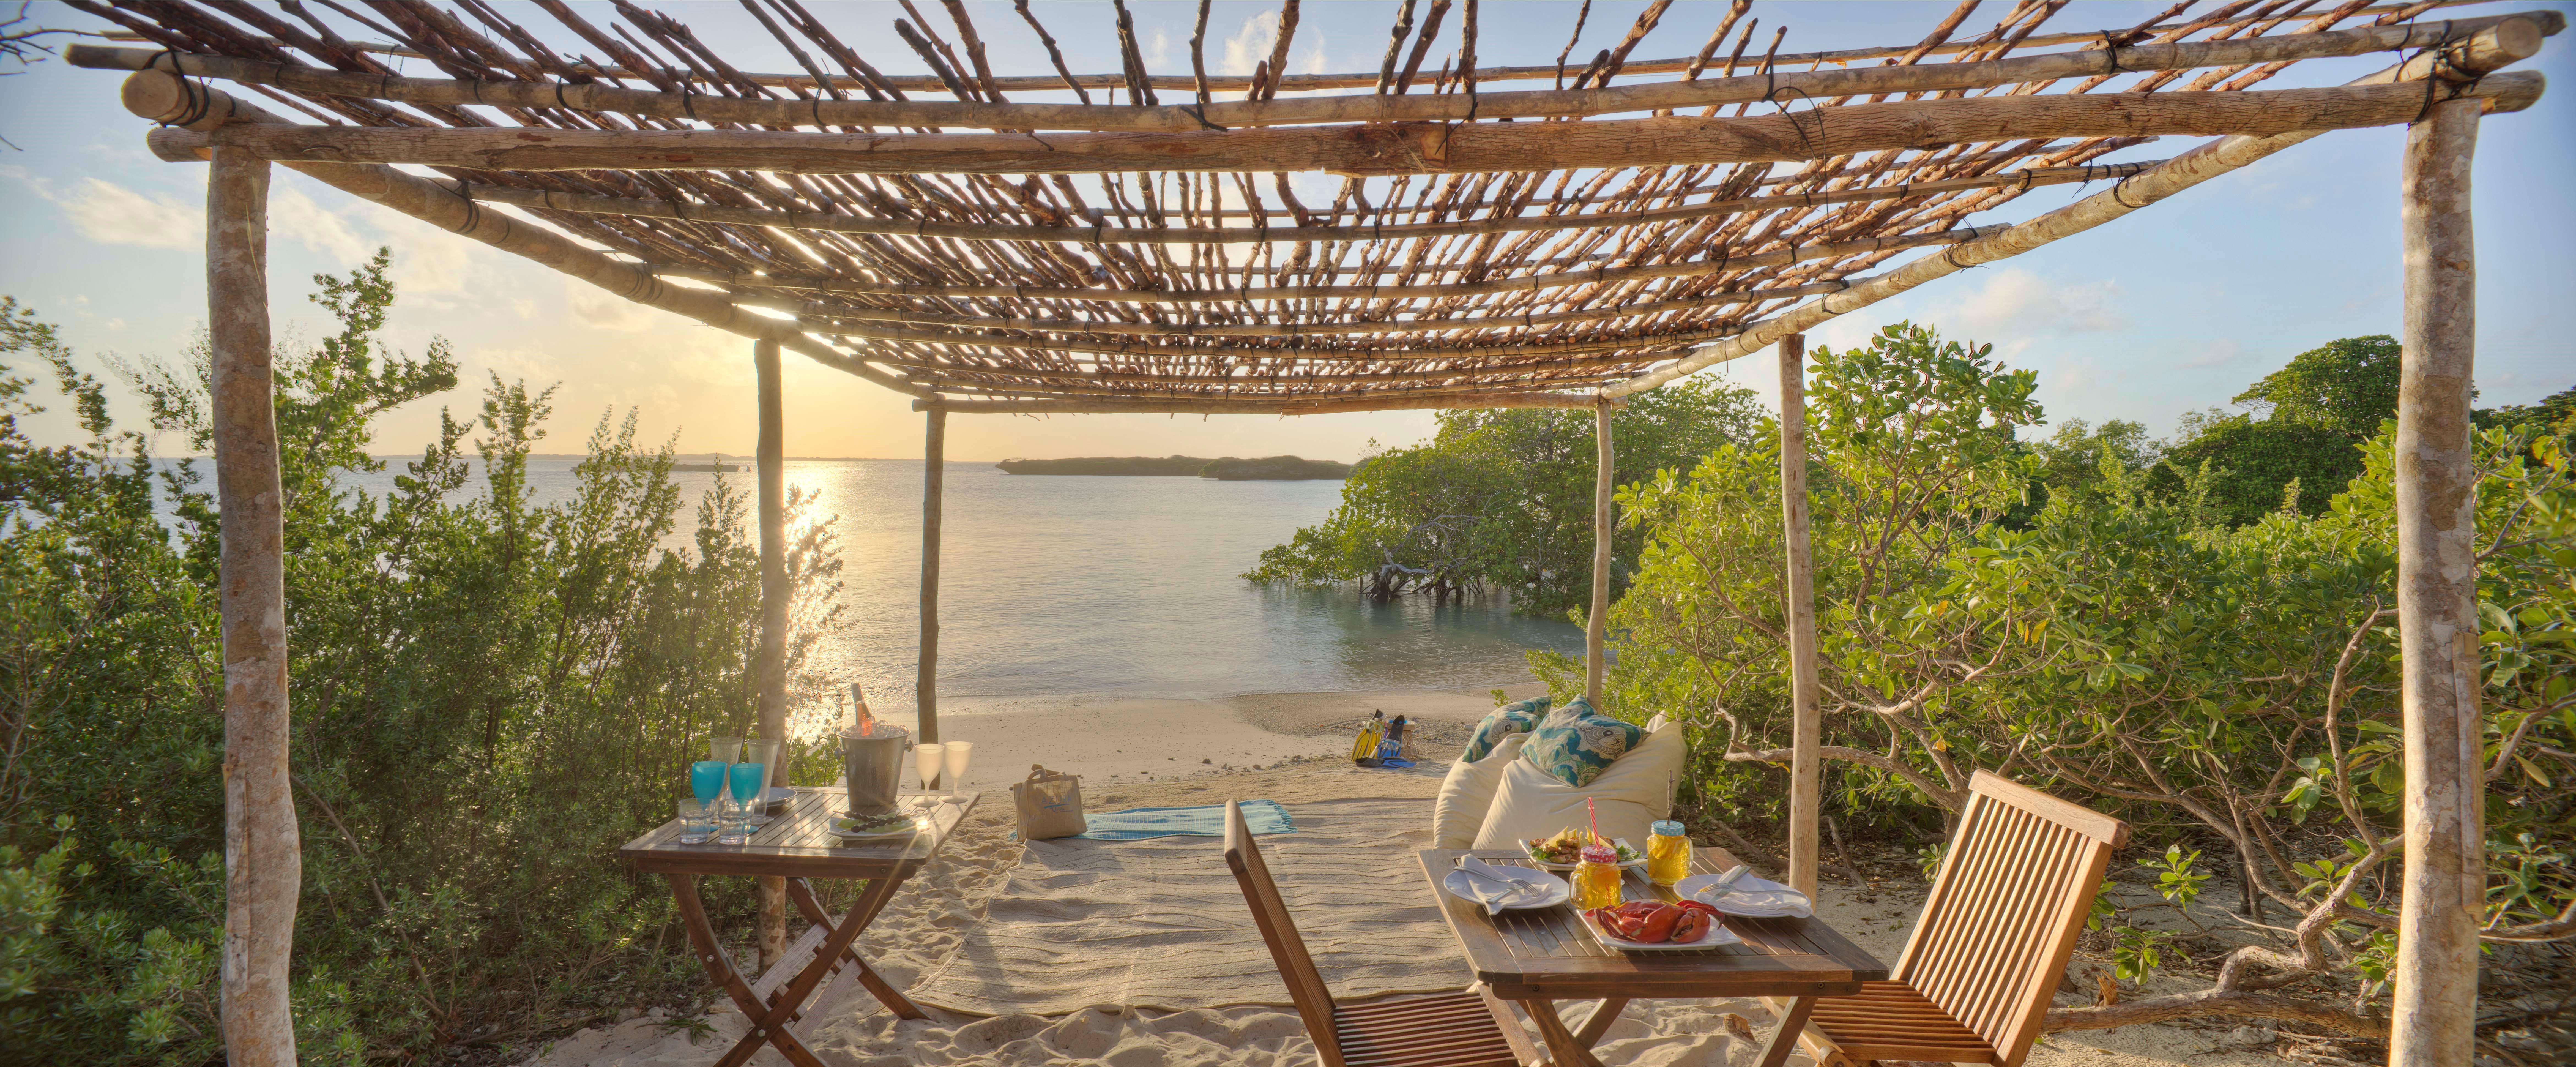 azura_quilalea_beach_picnic